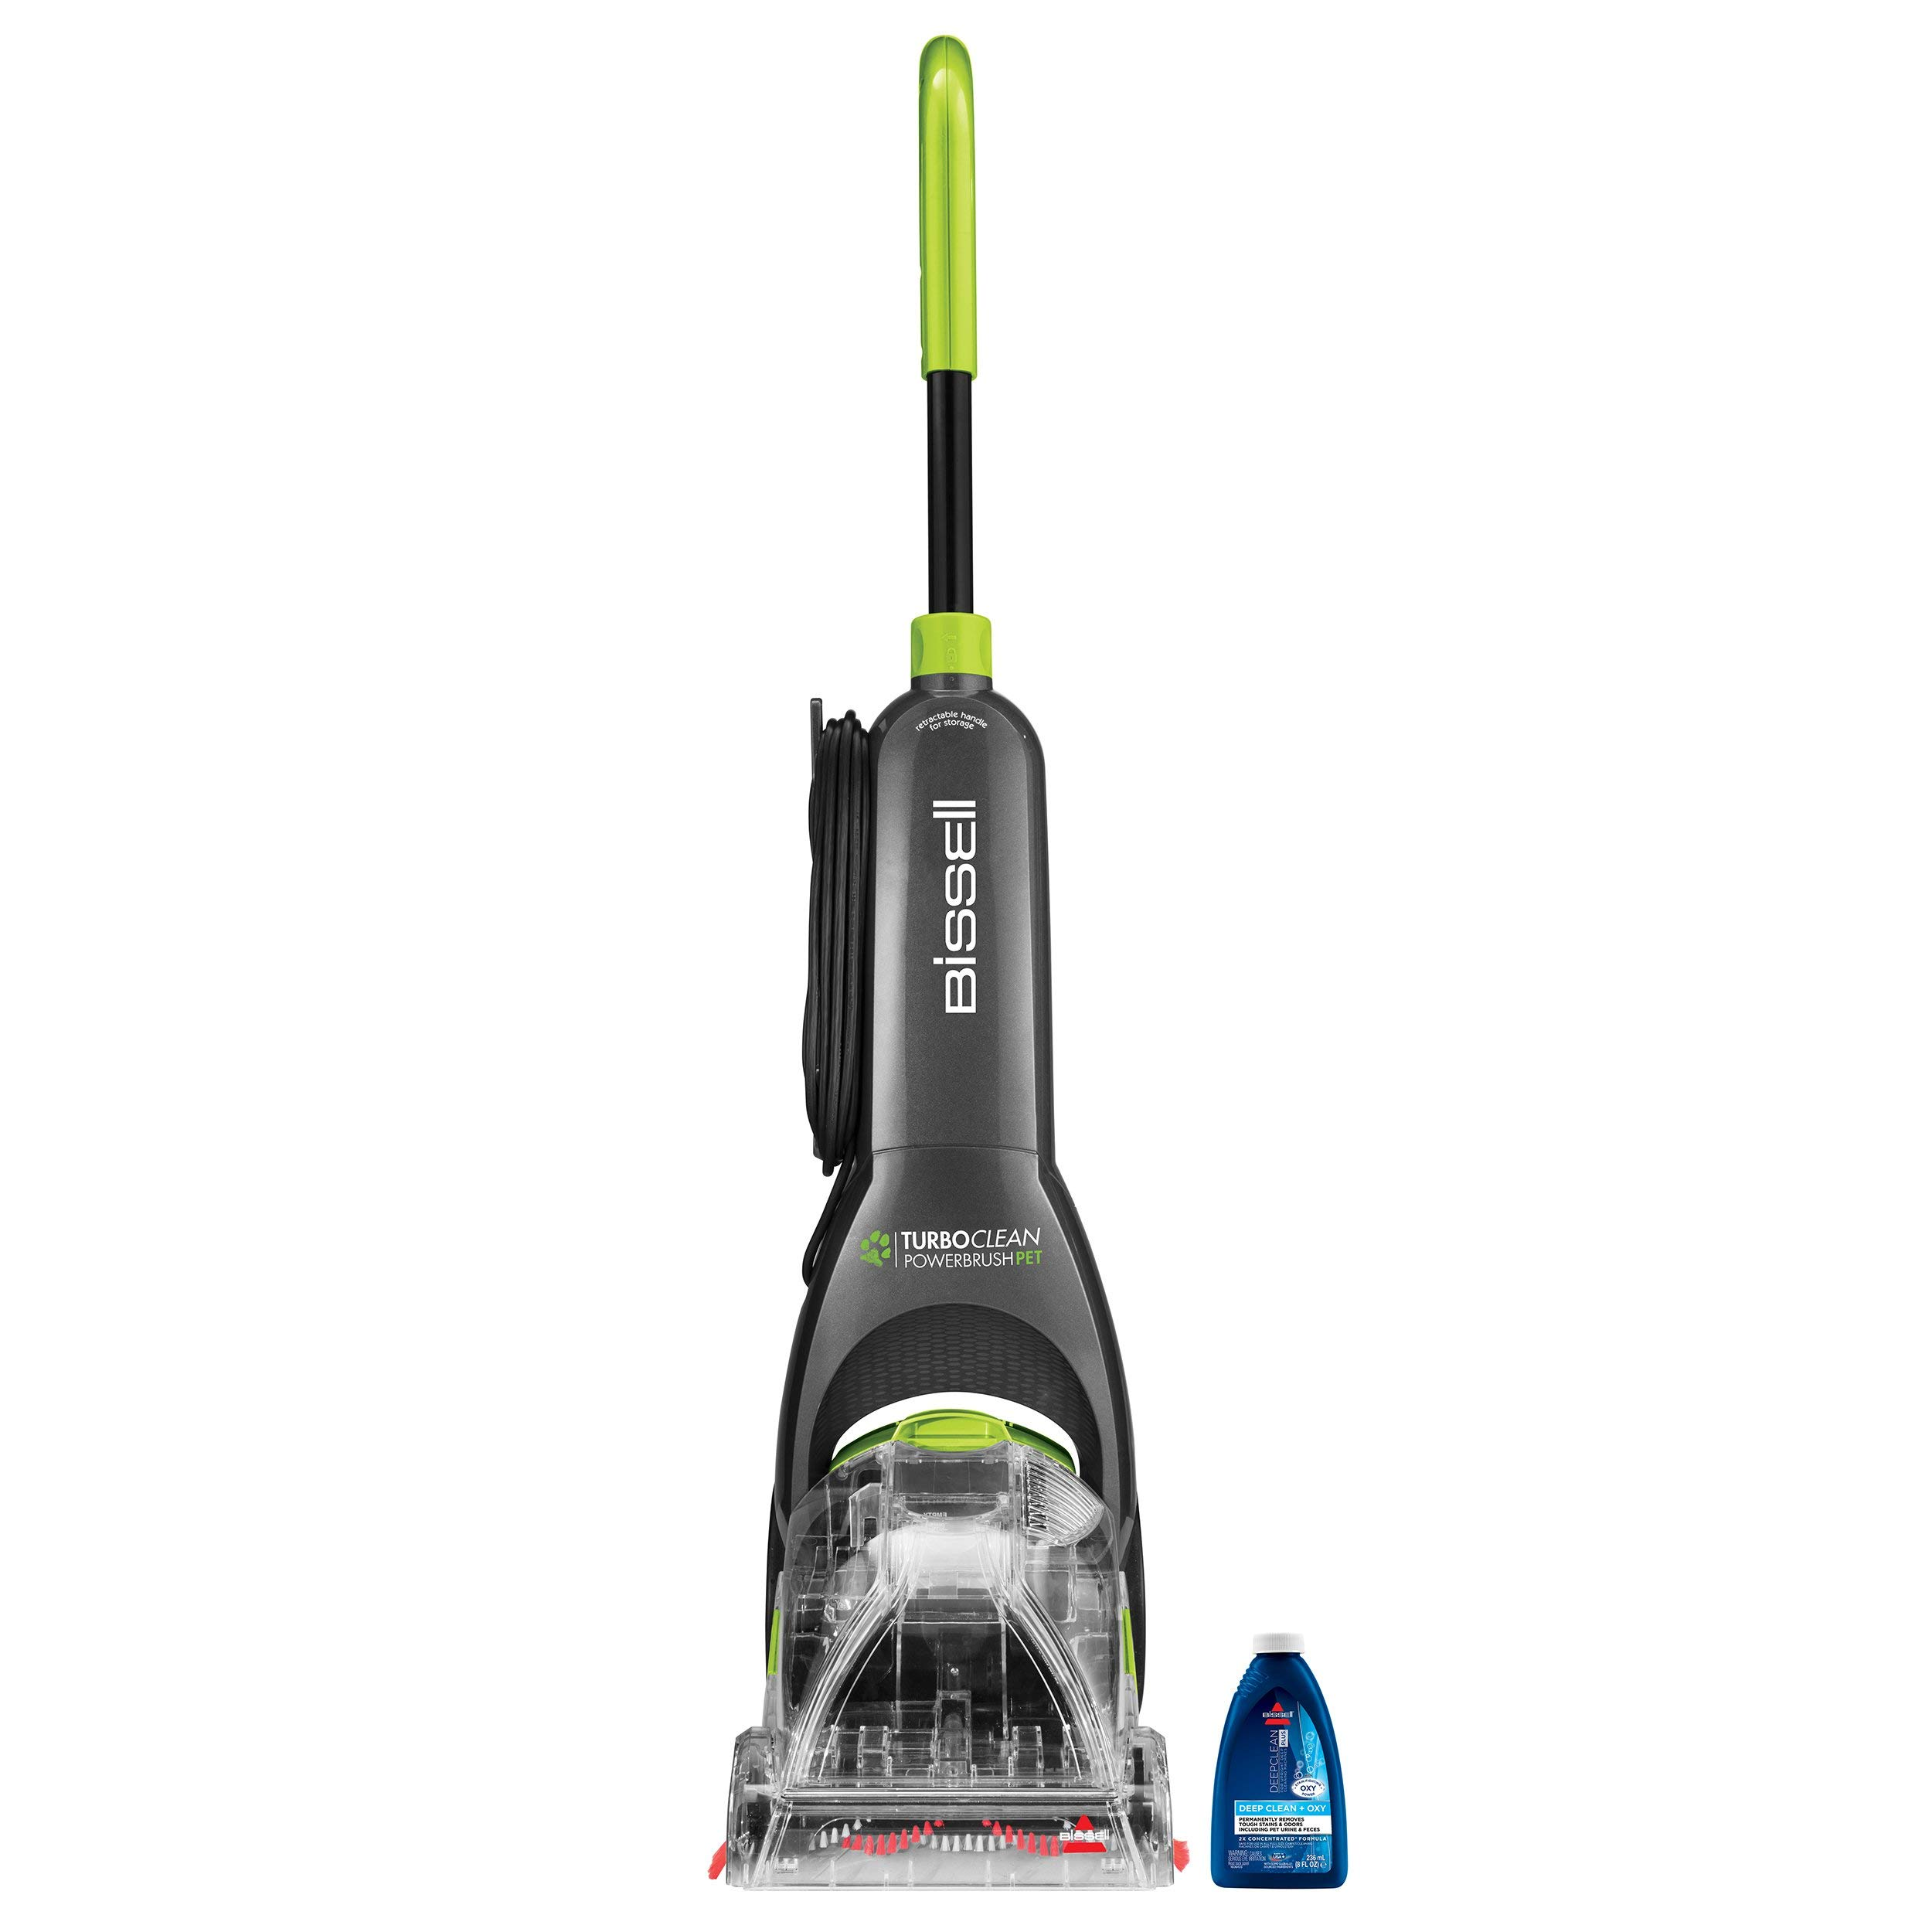 BISSELL Turboclean Powerbrush Upright Shampooer